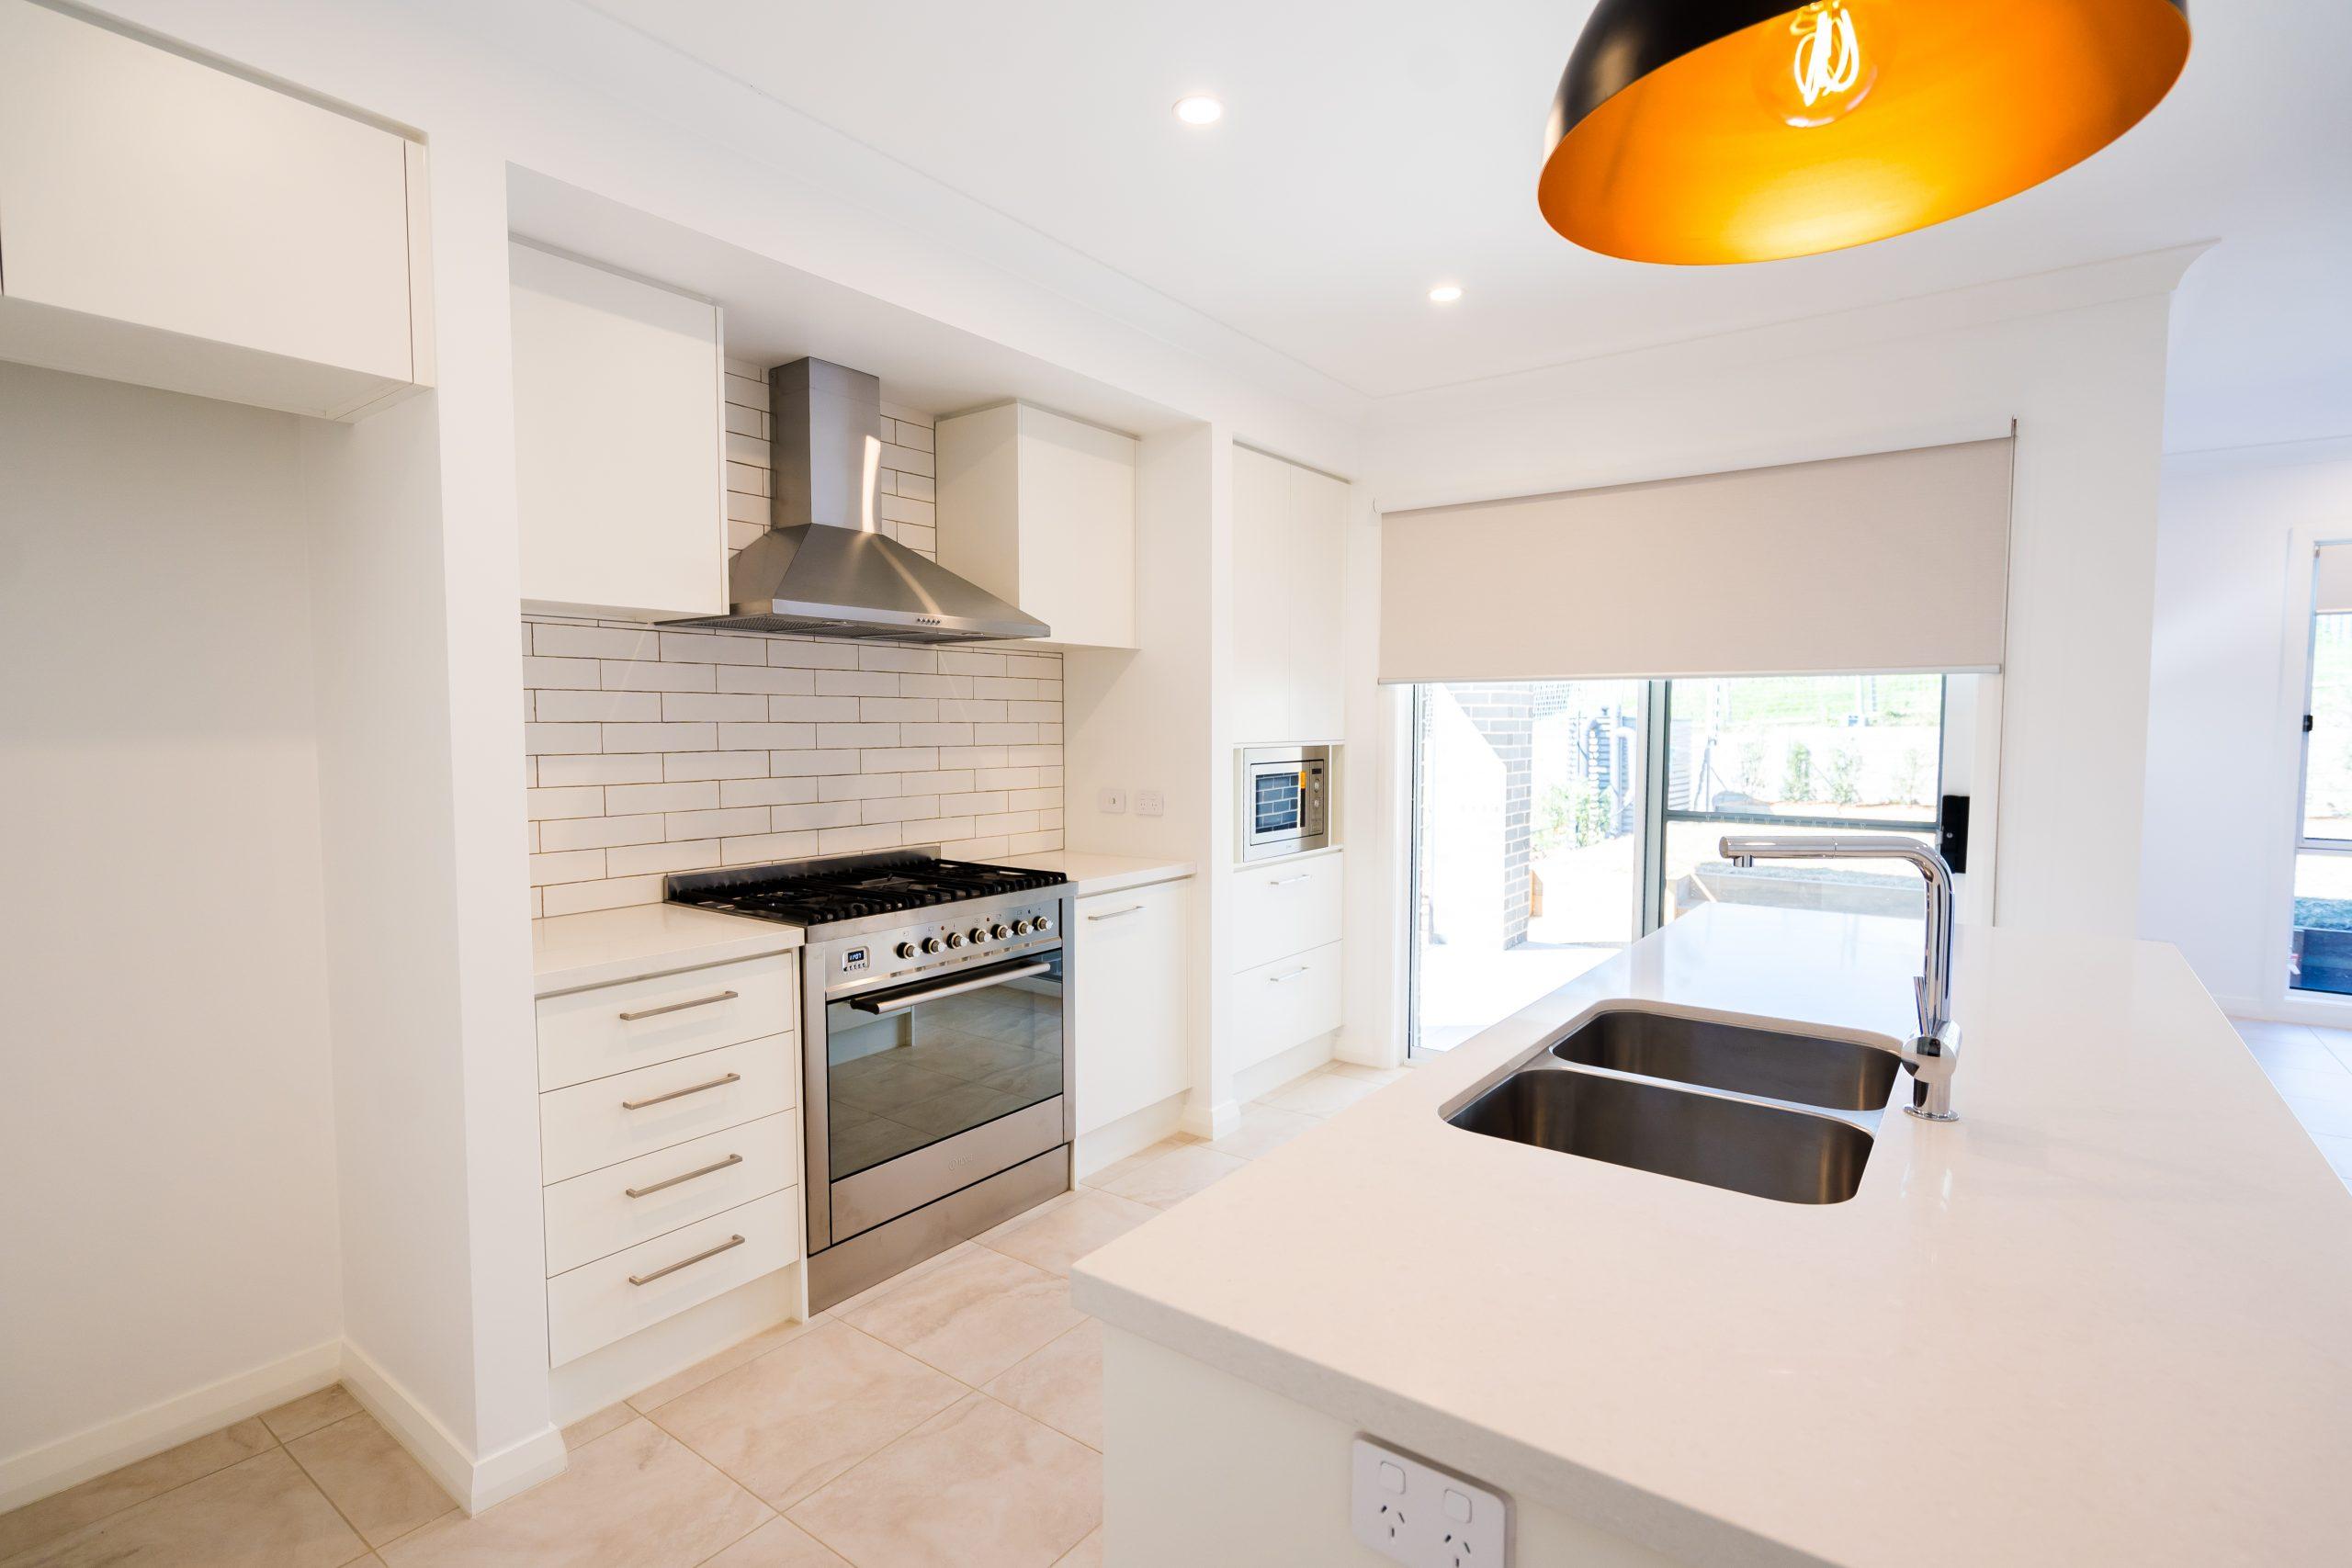 6 Yusen St, Riverstone, NSW 2765